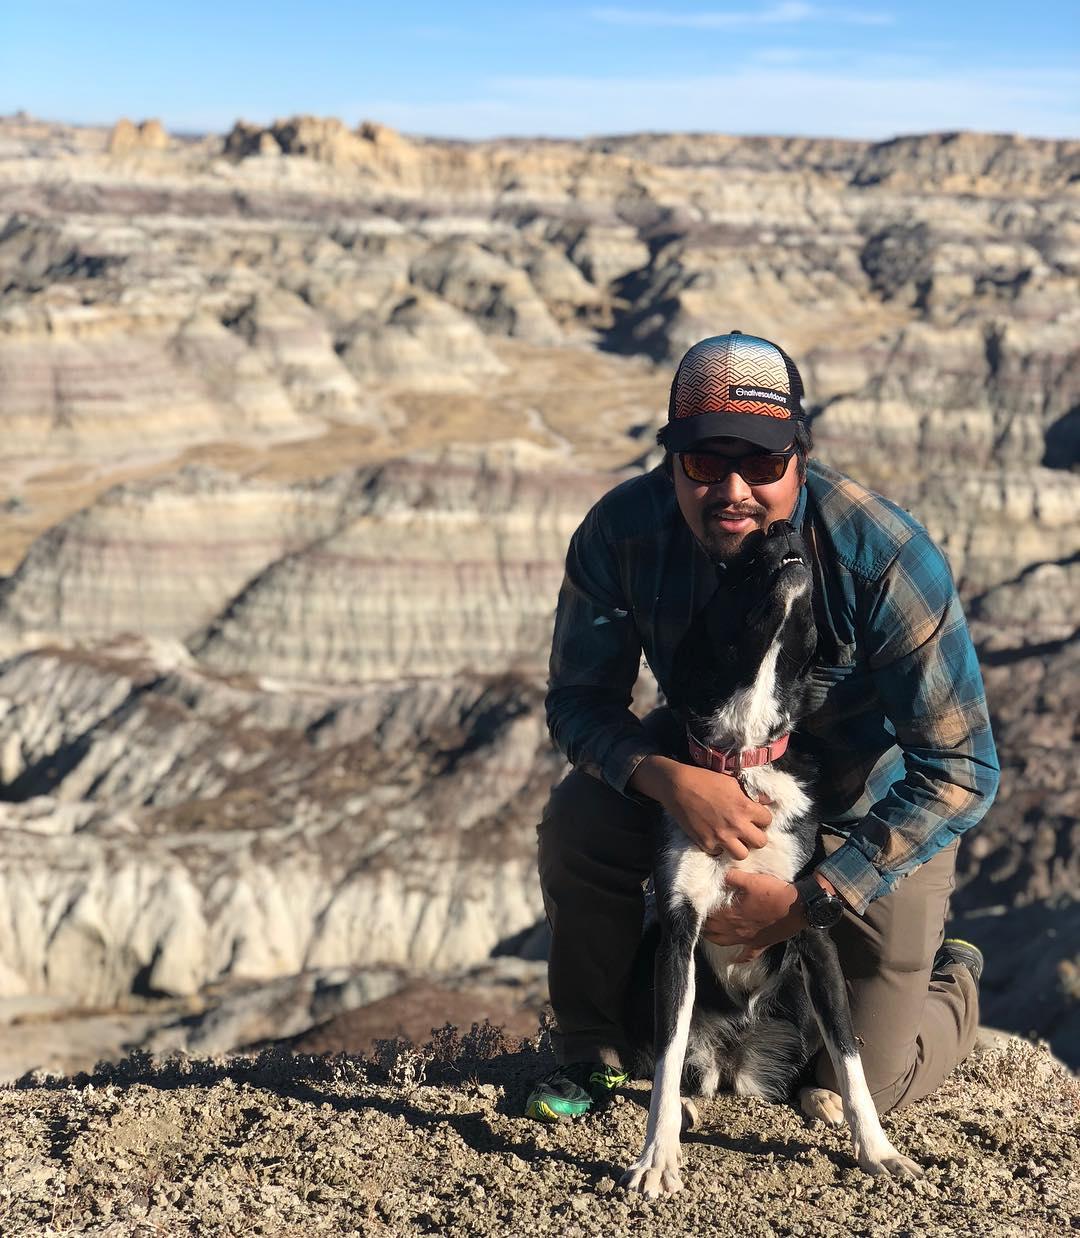 Len Necefer - CEO Natives Outdoors, Professor, Activist, Filmmaker, and board member Honnold Foundation and American Alpine Club.